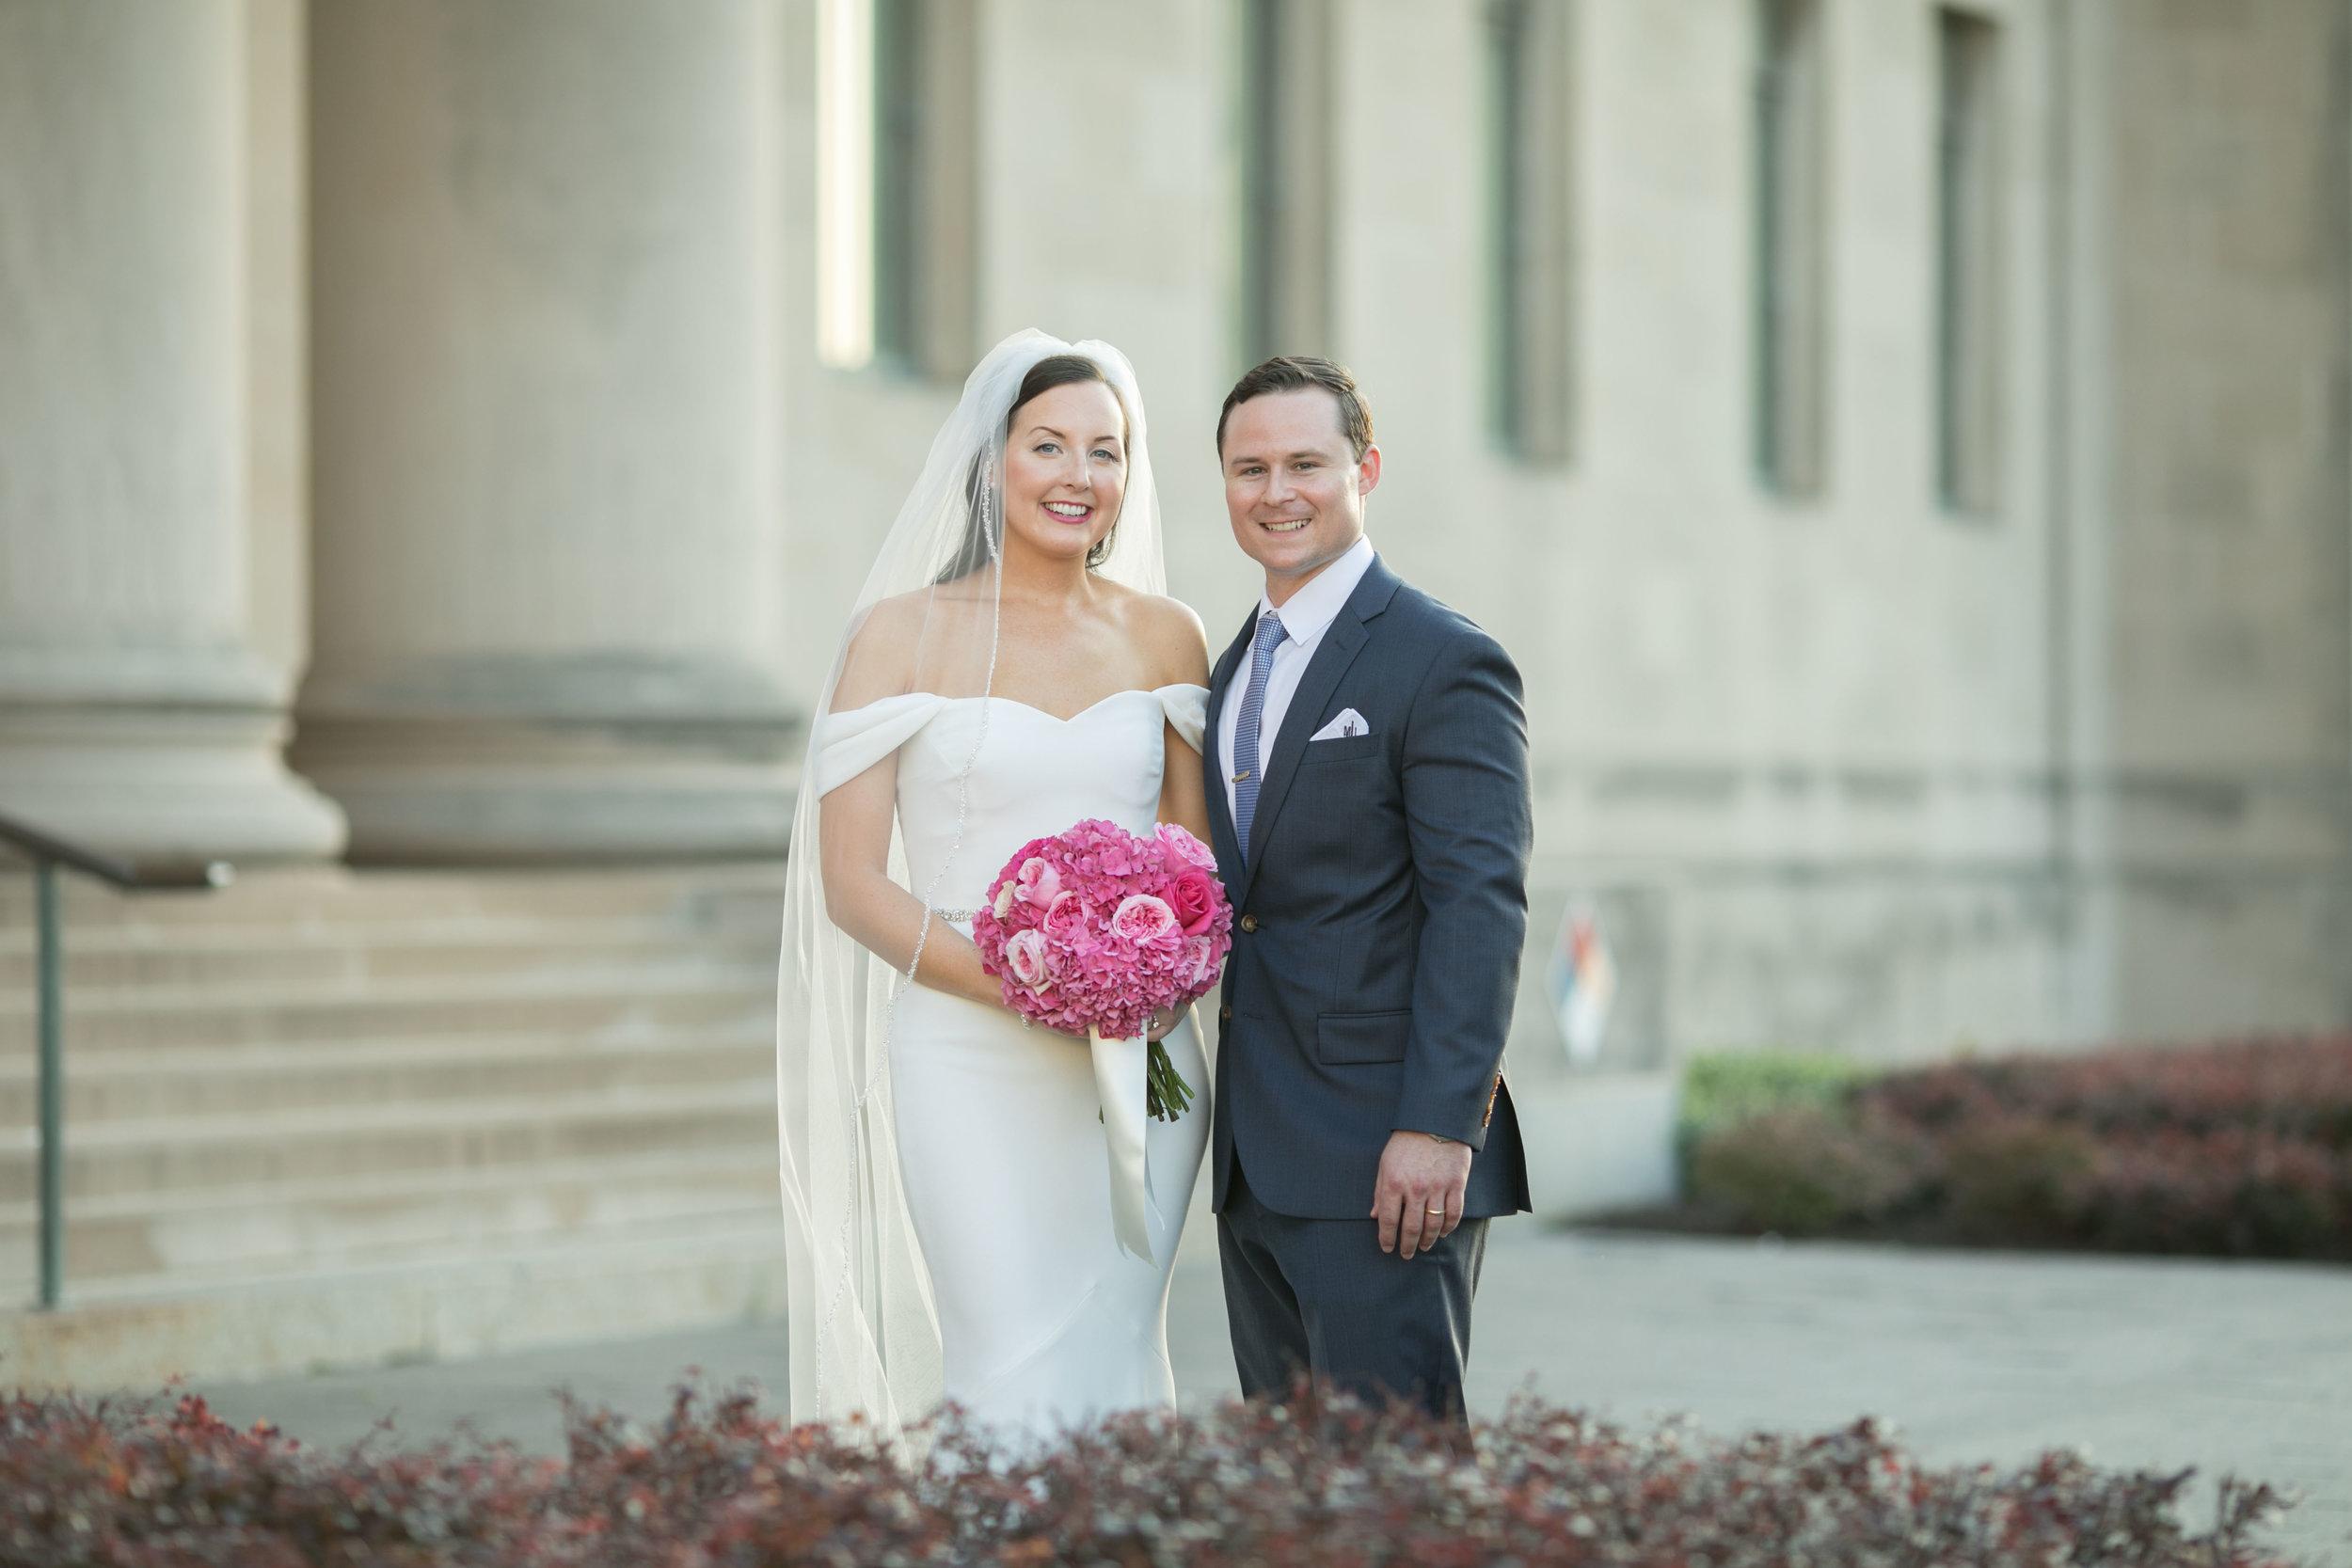 nelson-atkins-wedding-61.jpg